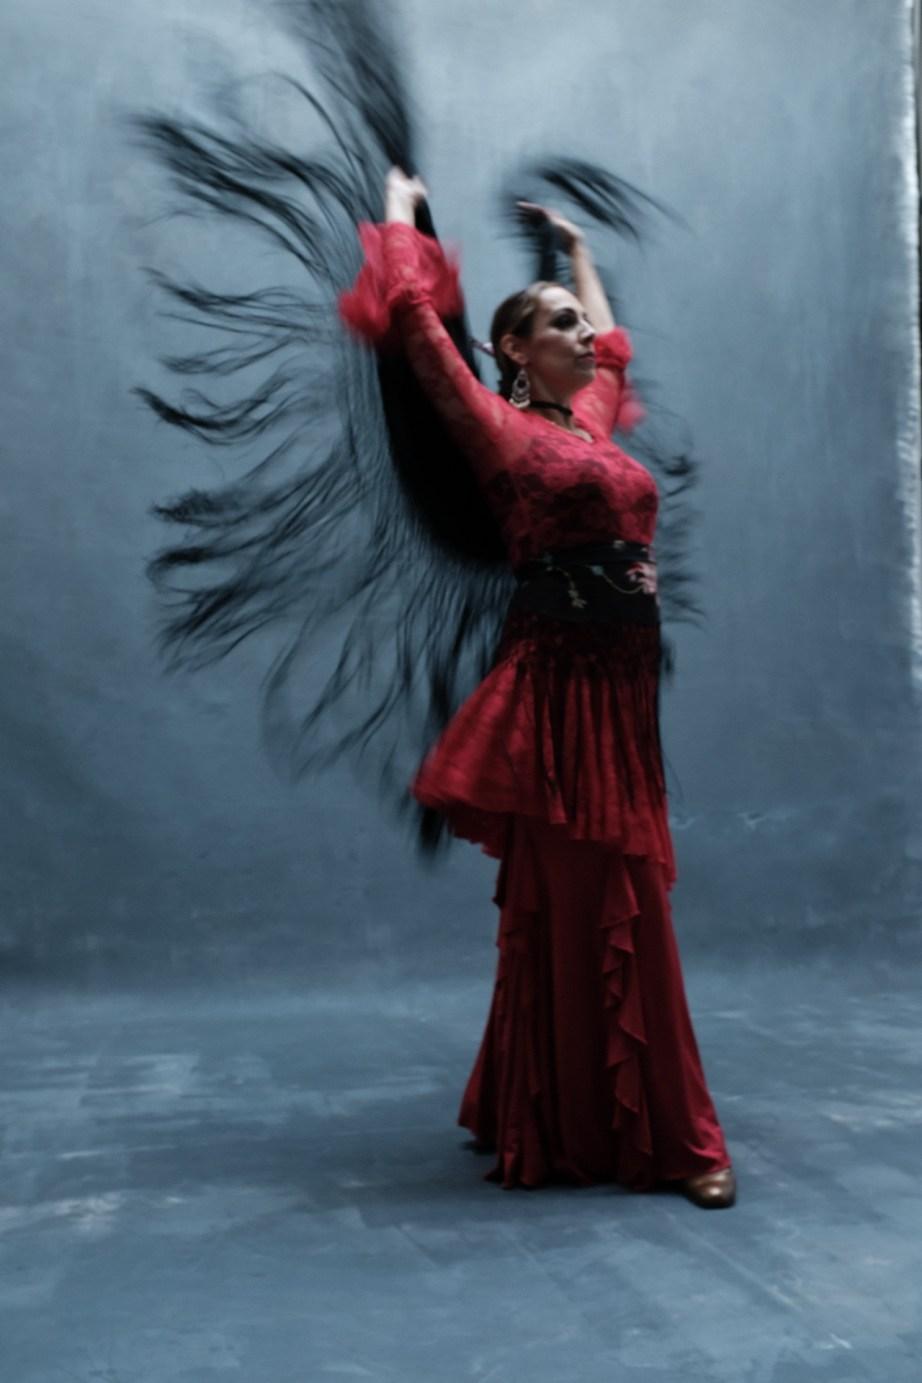 orange county photography studio nicole caldwell dance photographer 21